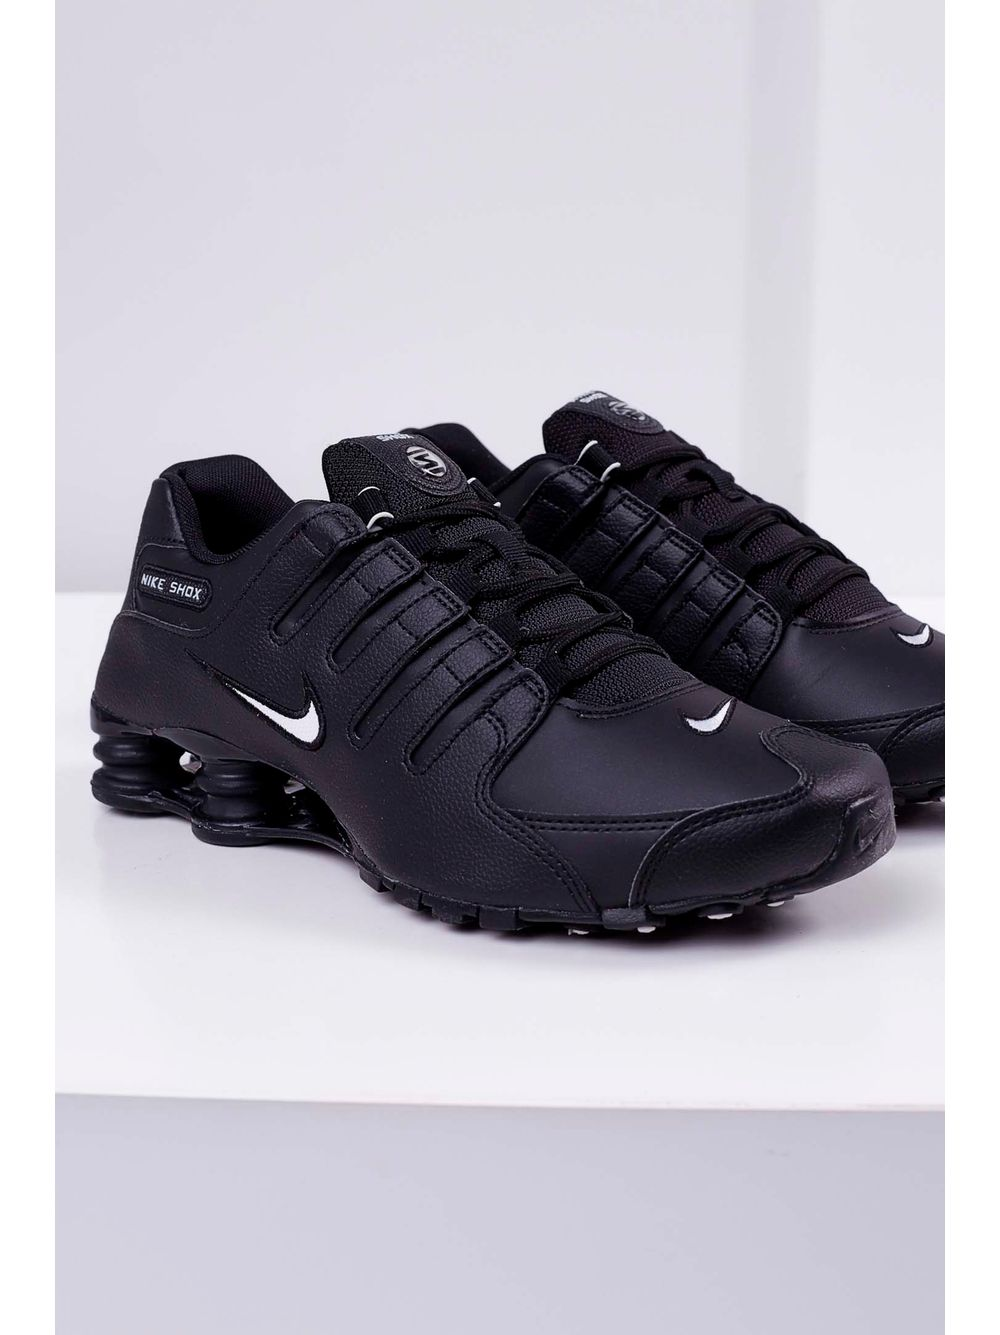 e429840ef6 Previous. Tenis-Nike-Shox-Nz-Eu-Shoe- ...